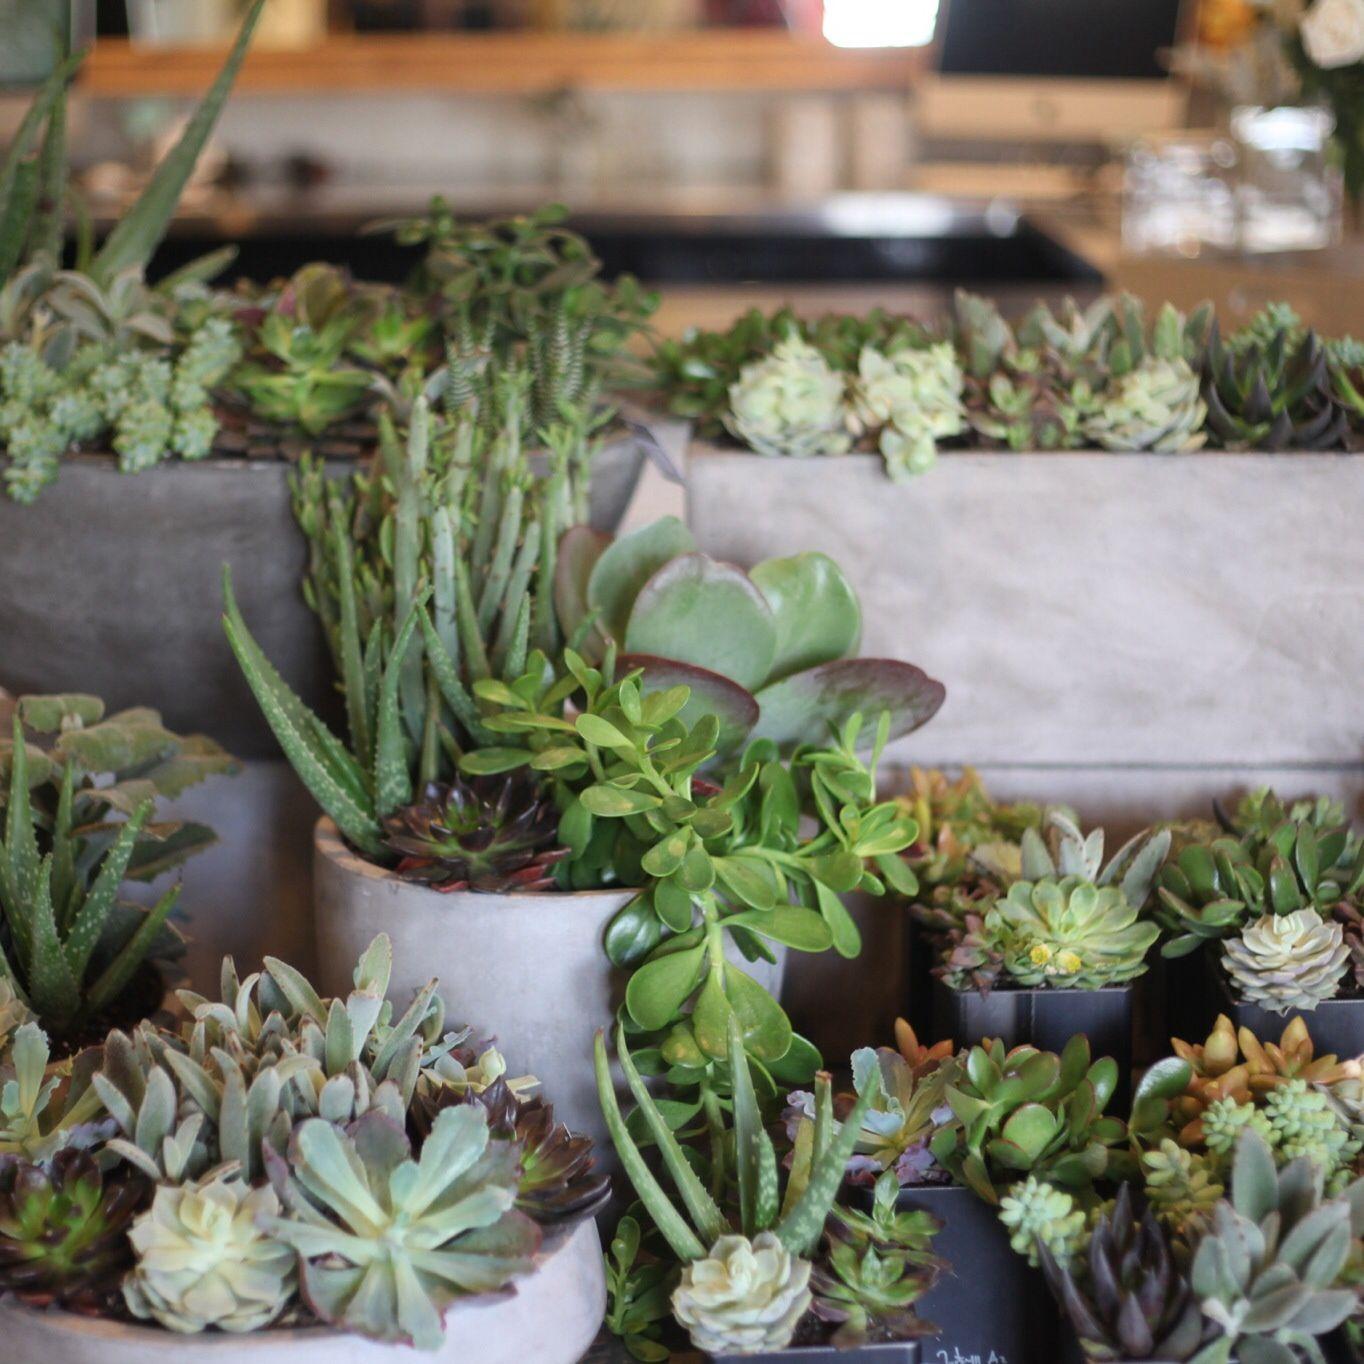 Camelback flower shop in phoenix arizona eatsandsights